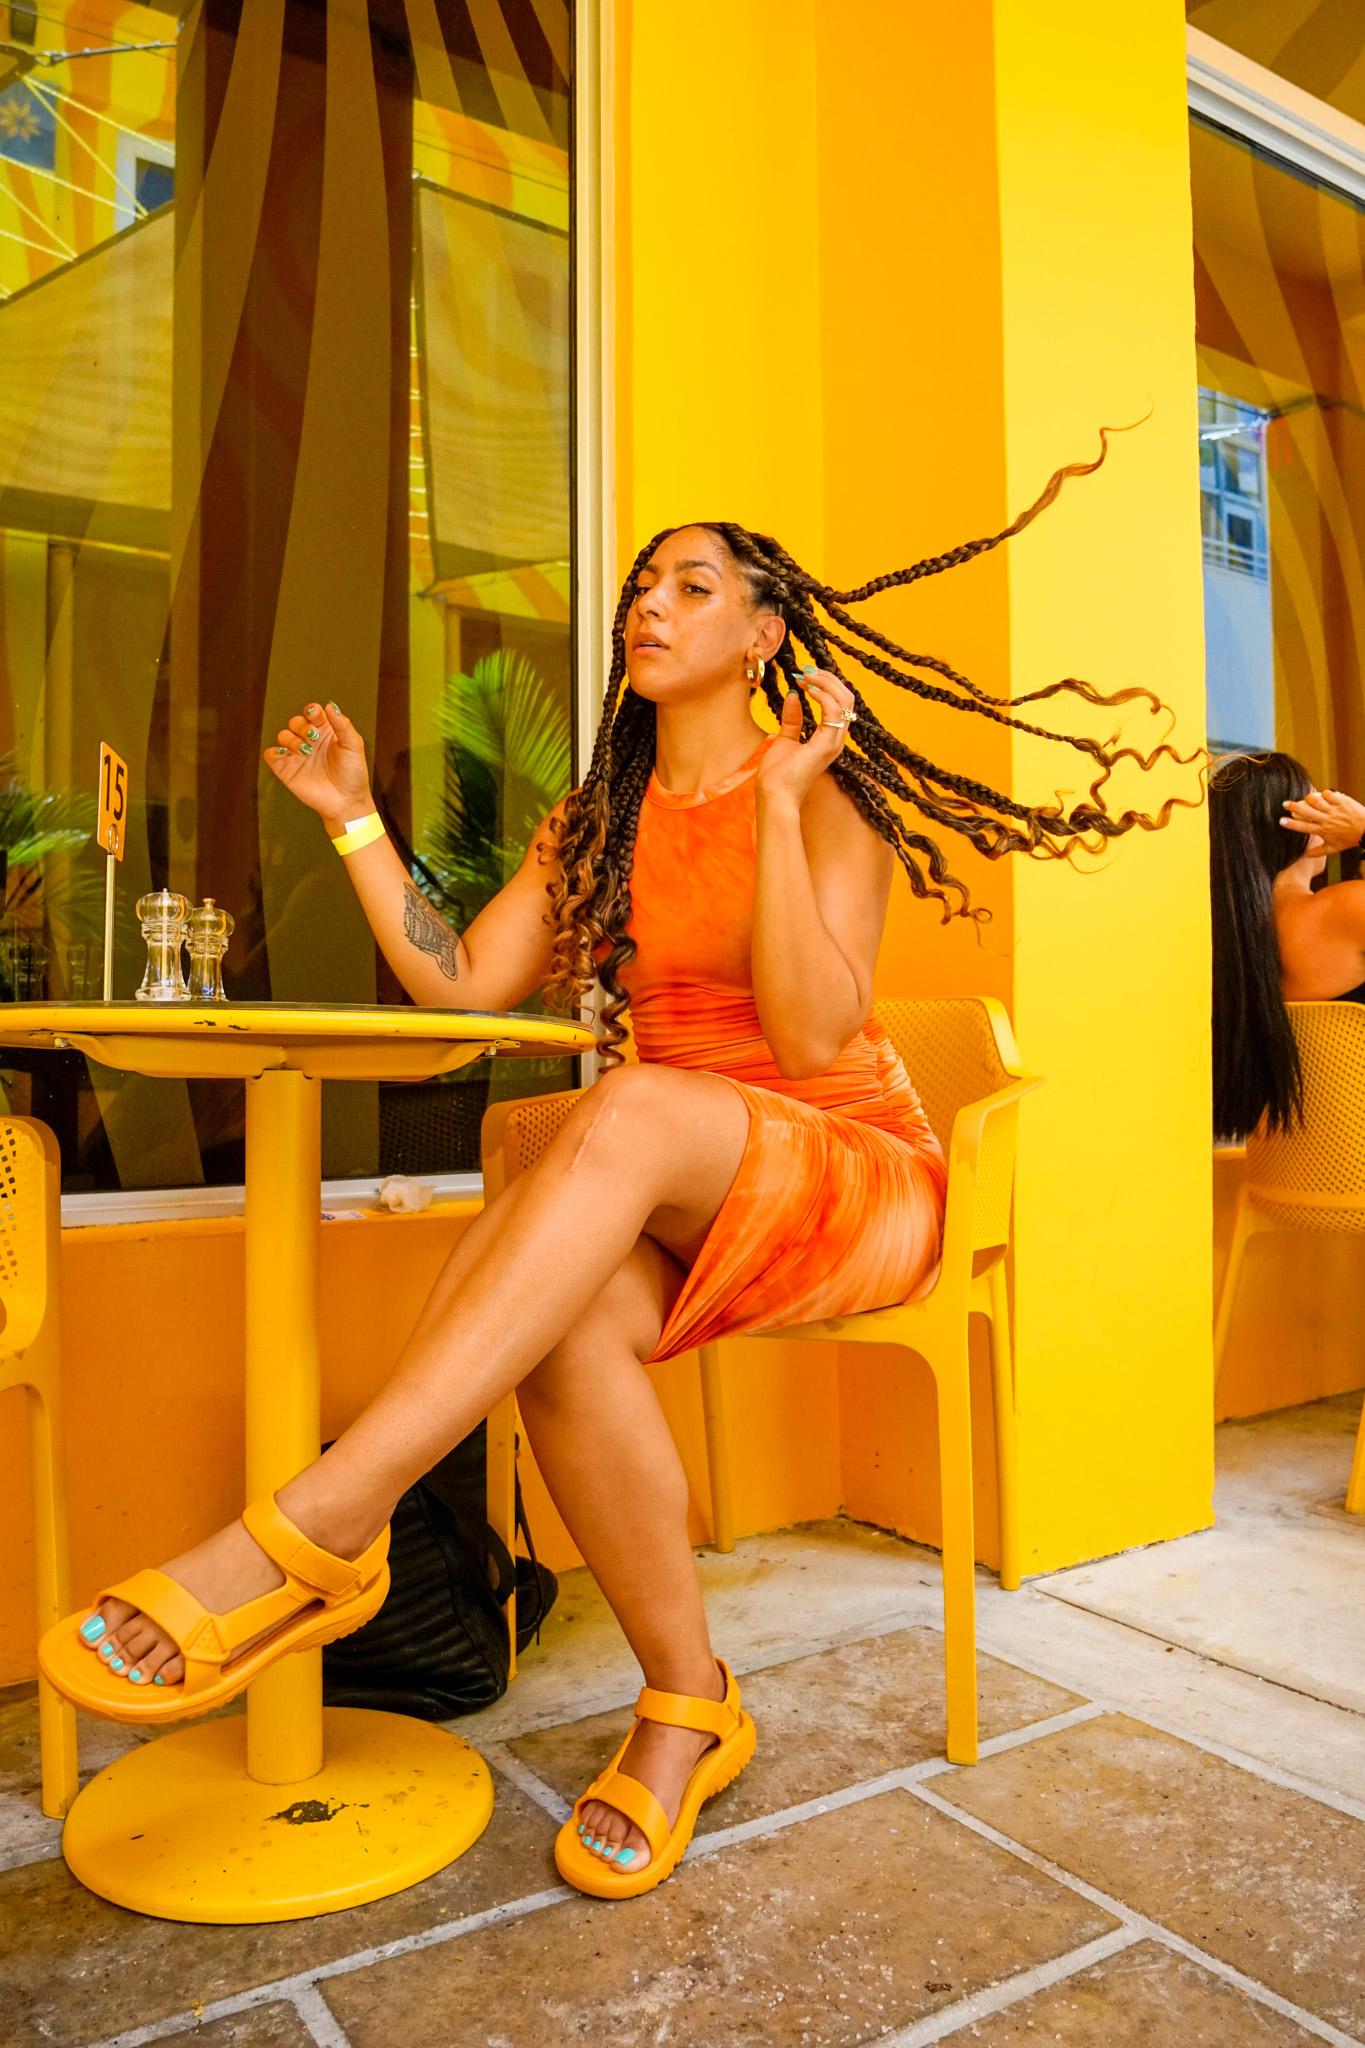 what to wear in Miami, black girl solo travel guide to Miami Beach Florida, luxury hotel Miami Beach, Miami Beach travel guide